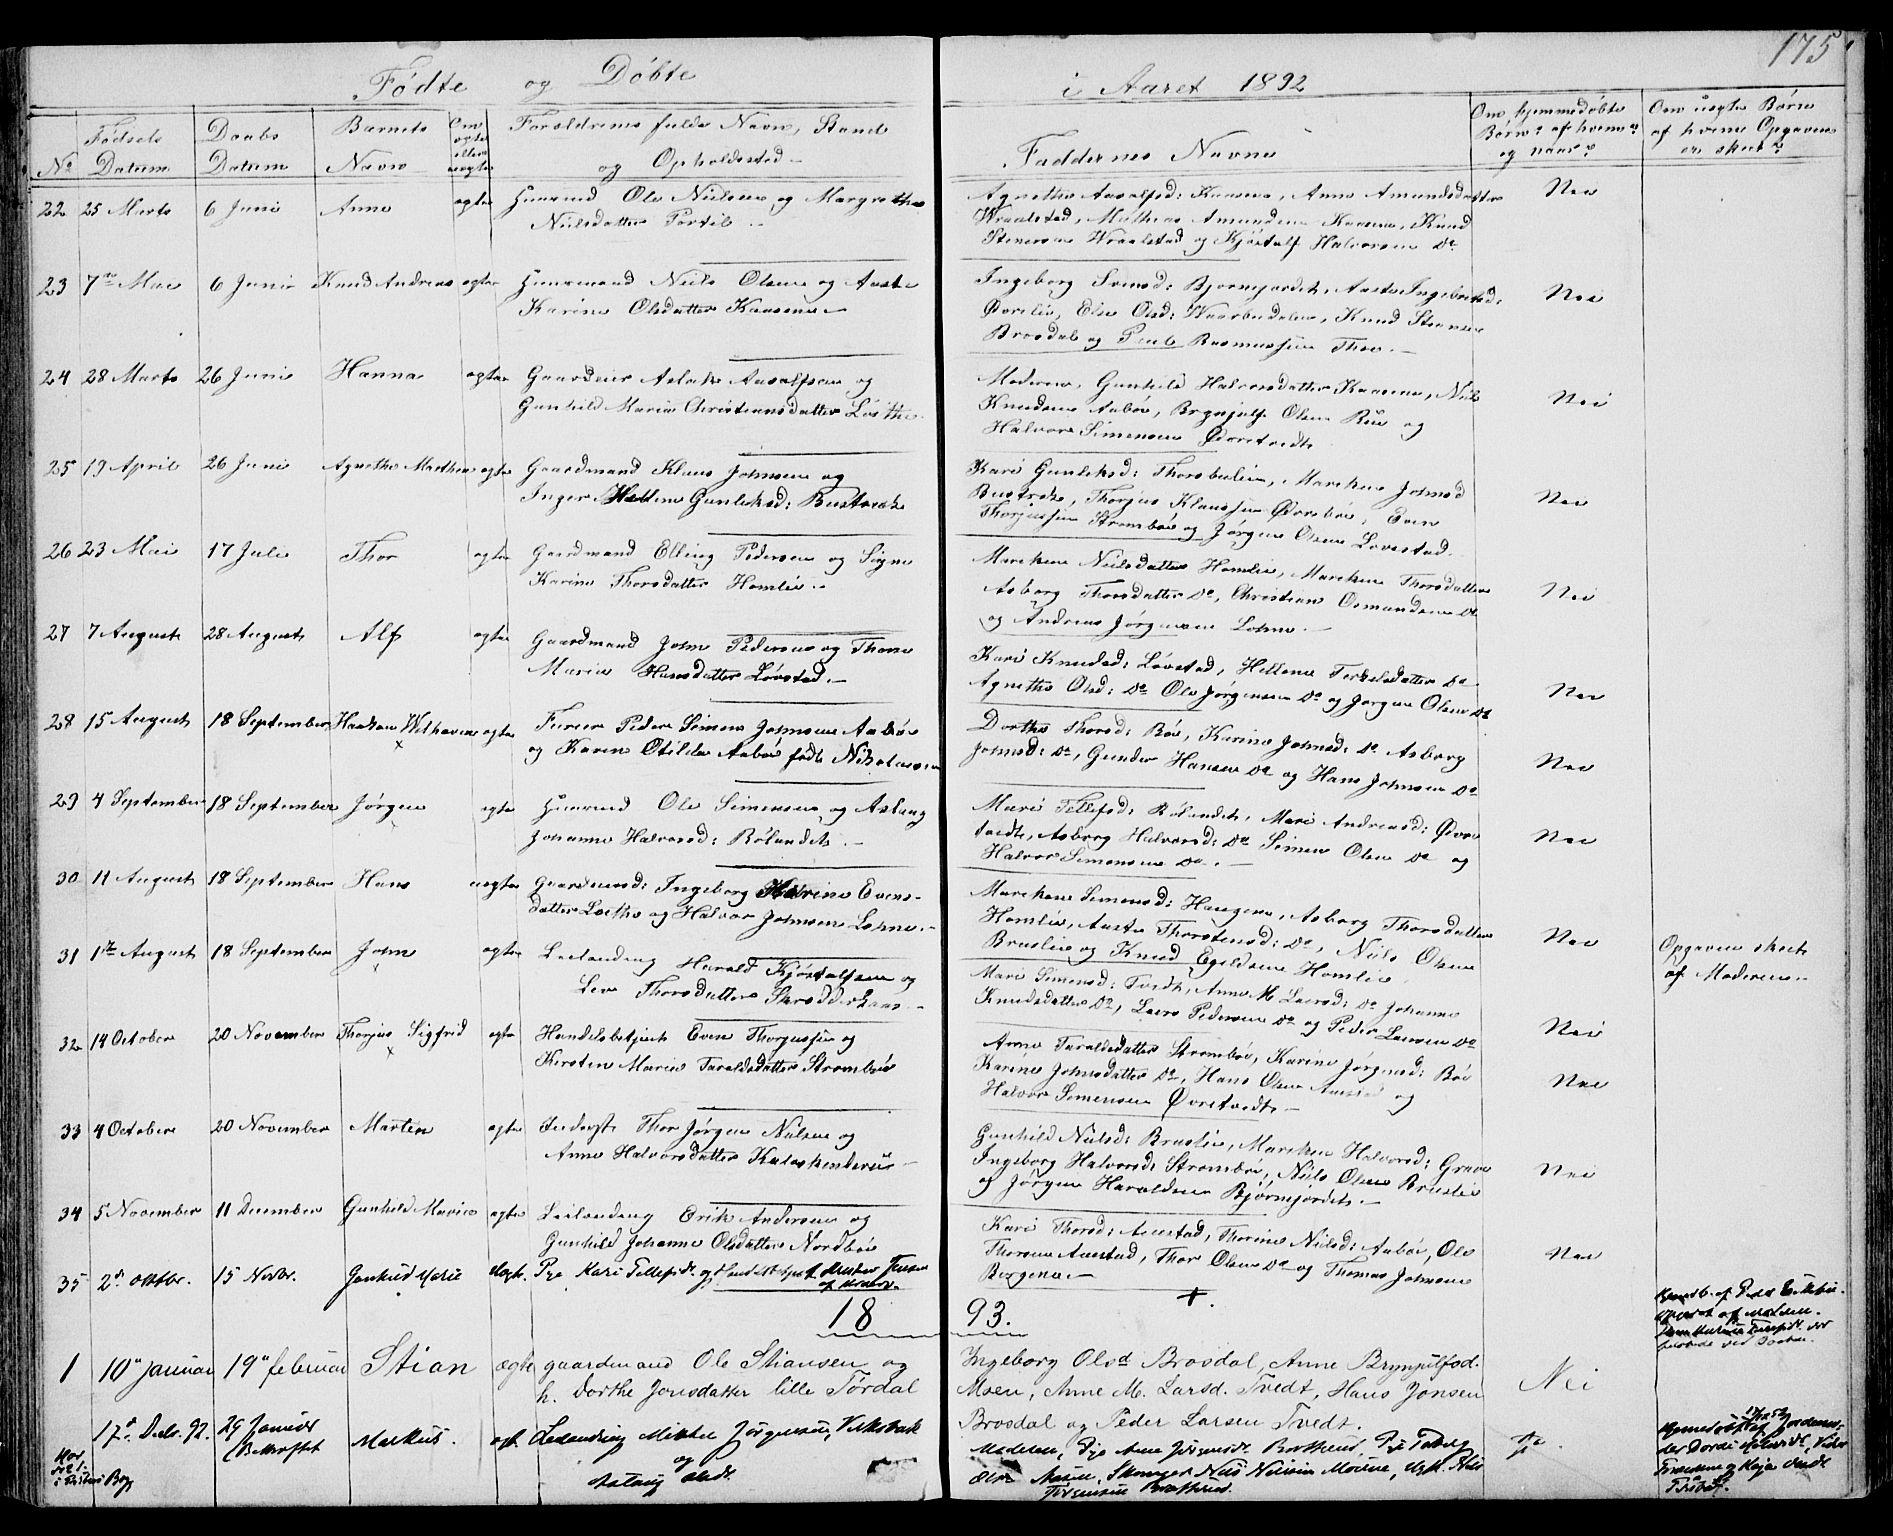 SAKO, Drangedal kirkebøker, G/Gb/L0001: Klokkerbok nr. II 1, 1856-1894, s. 175